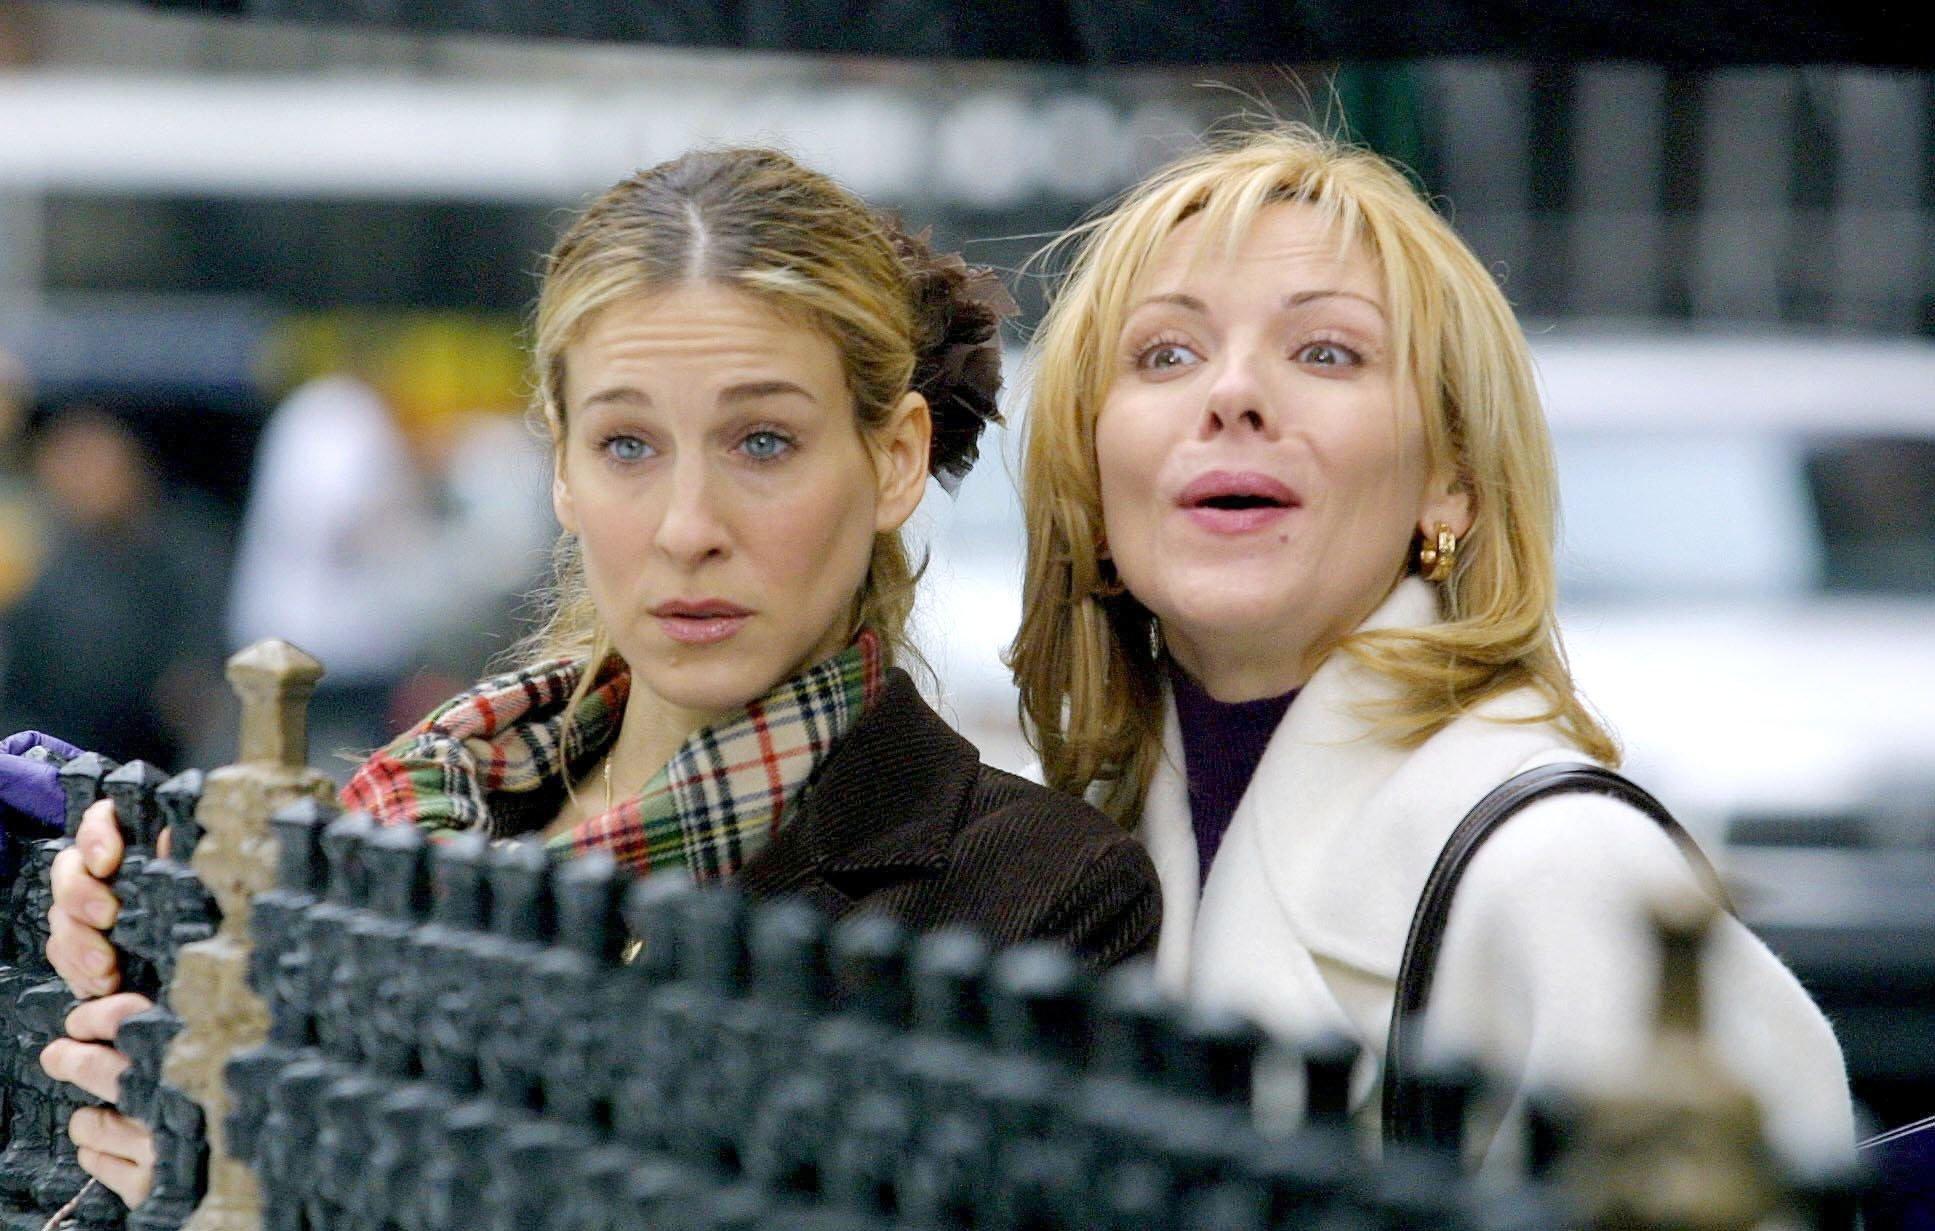 Kim Cattrall says Ellen Degeneres would make a 'fabulous' Samantha Jones in SATC 3